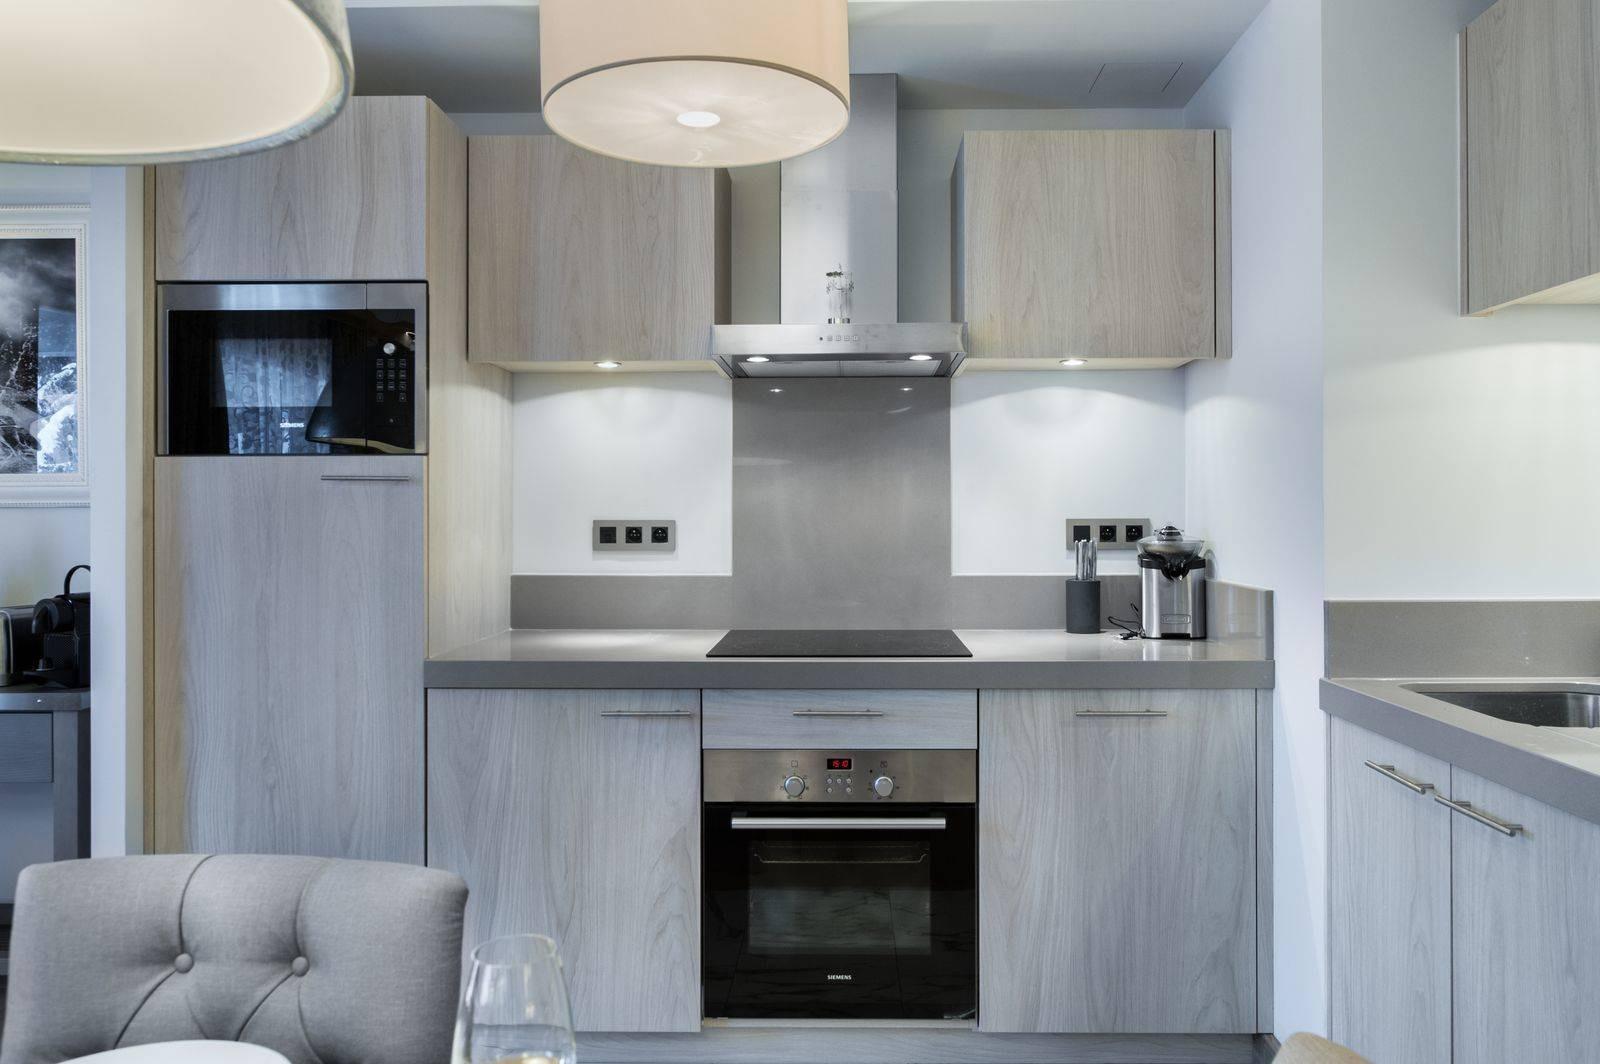 Courchevel 1550 Location Appartement Luxe Telokia Cuisine